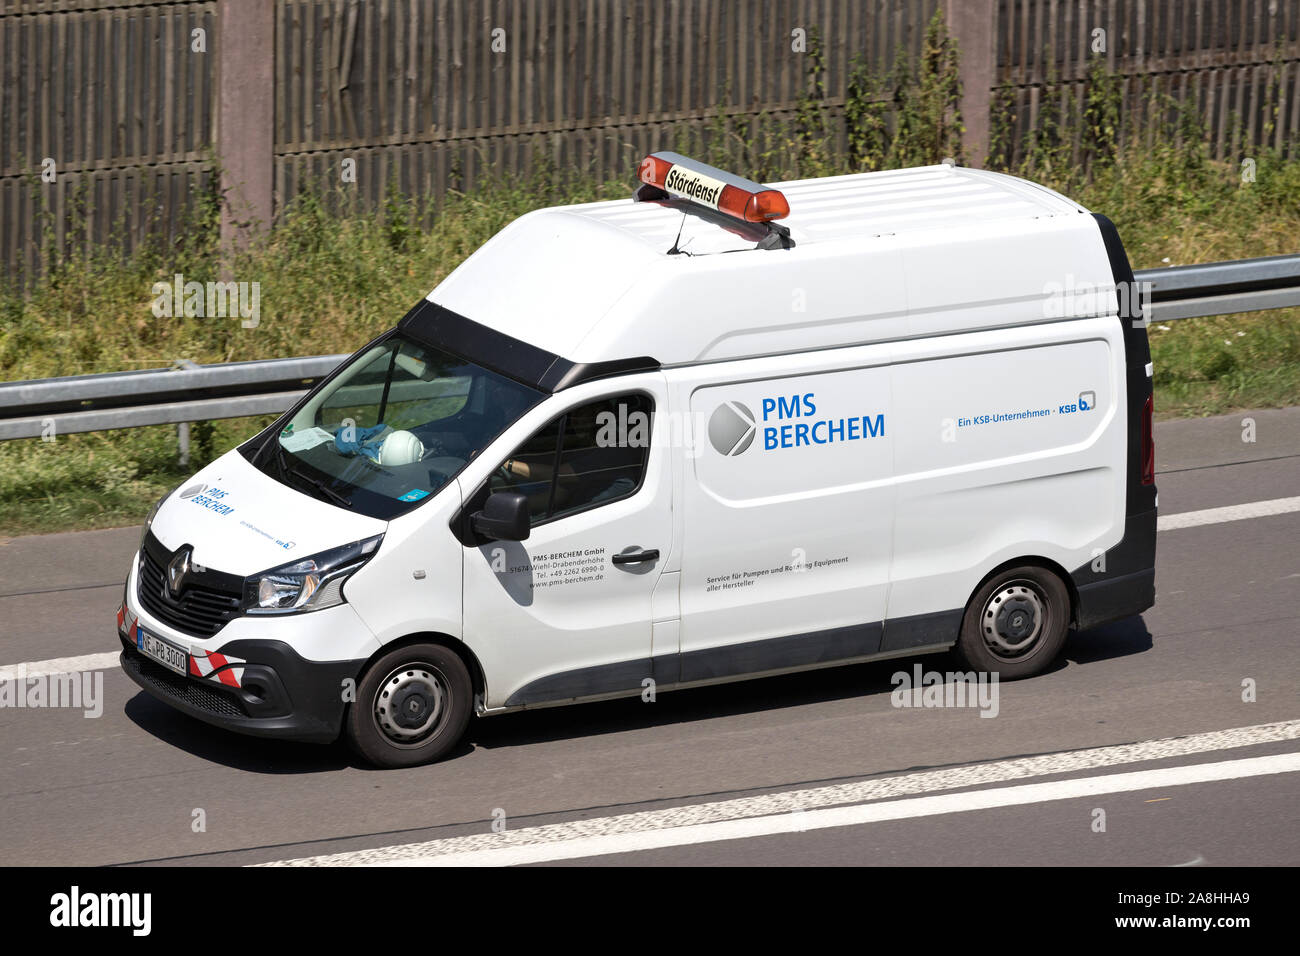 PMS Berchem Renault van on motorway. Stock Photo